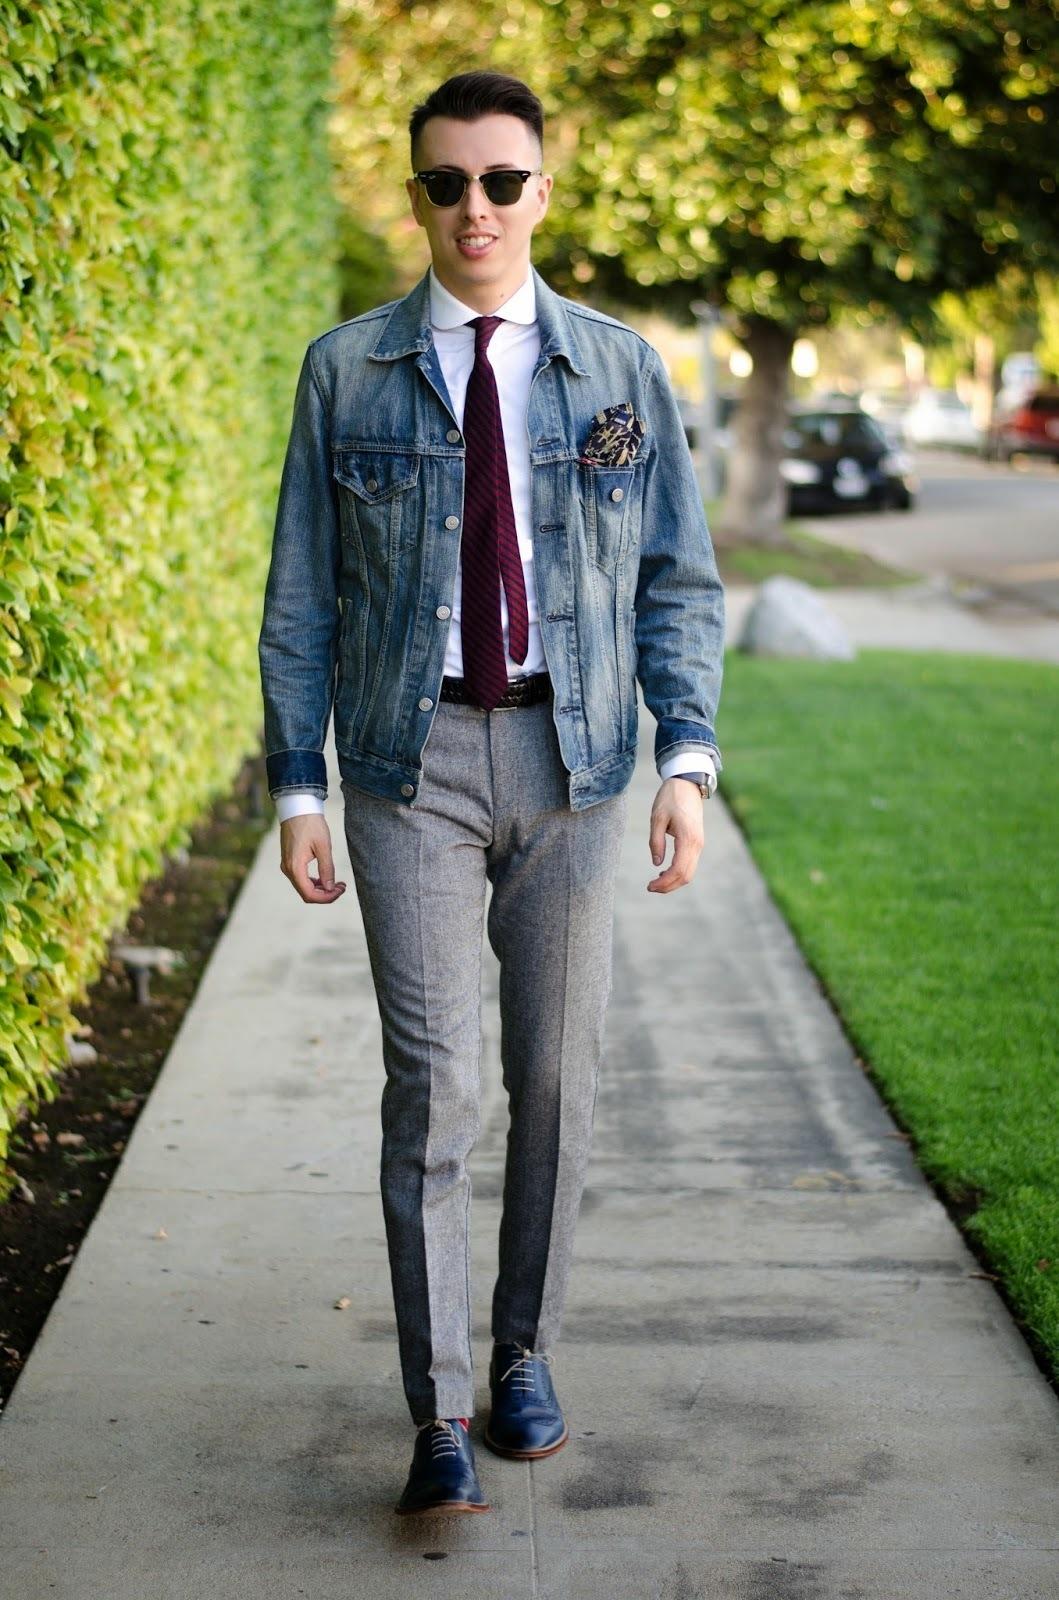 Men's White Dress Shirt, Grey Dress Pants, Navy Leather Oxford Shoes, Dark  Purple Vertical Striped Tie | Men's Fashion